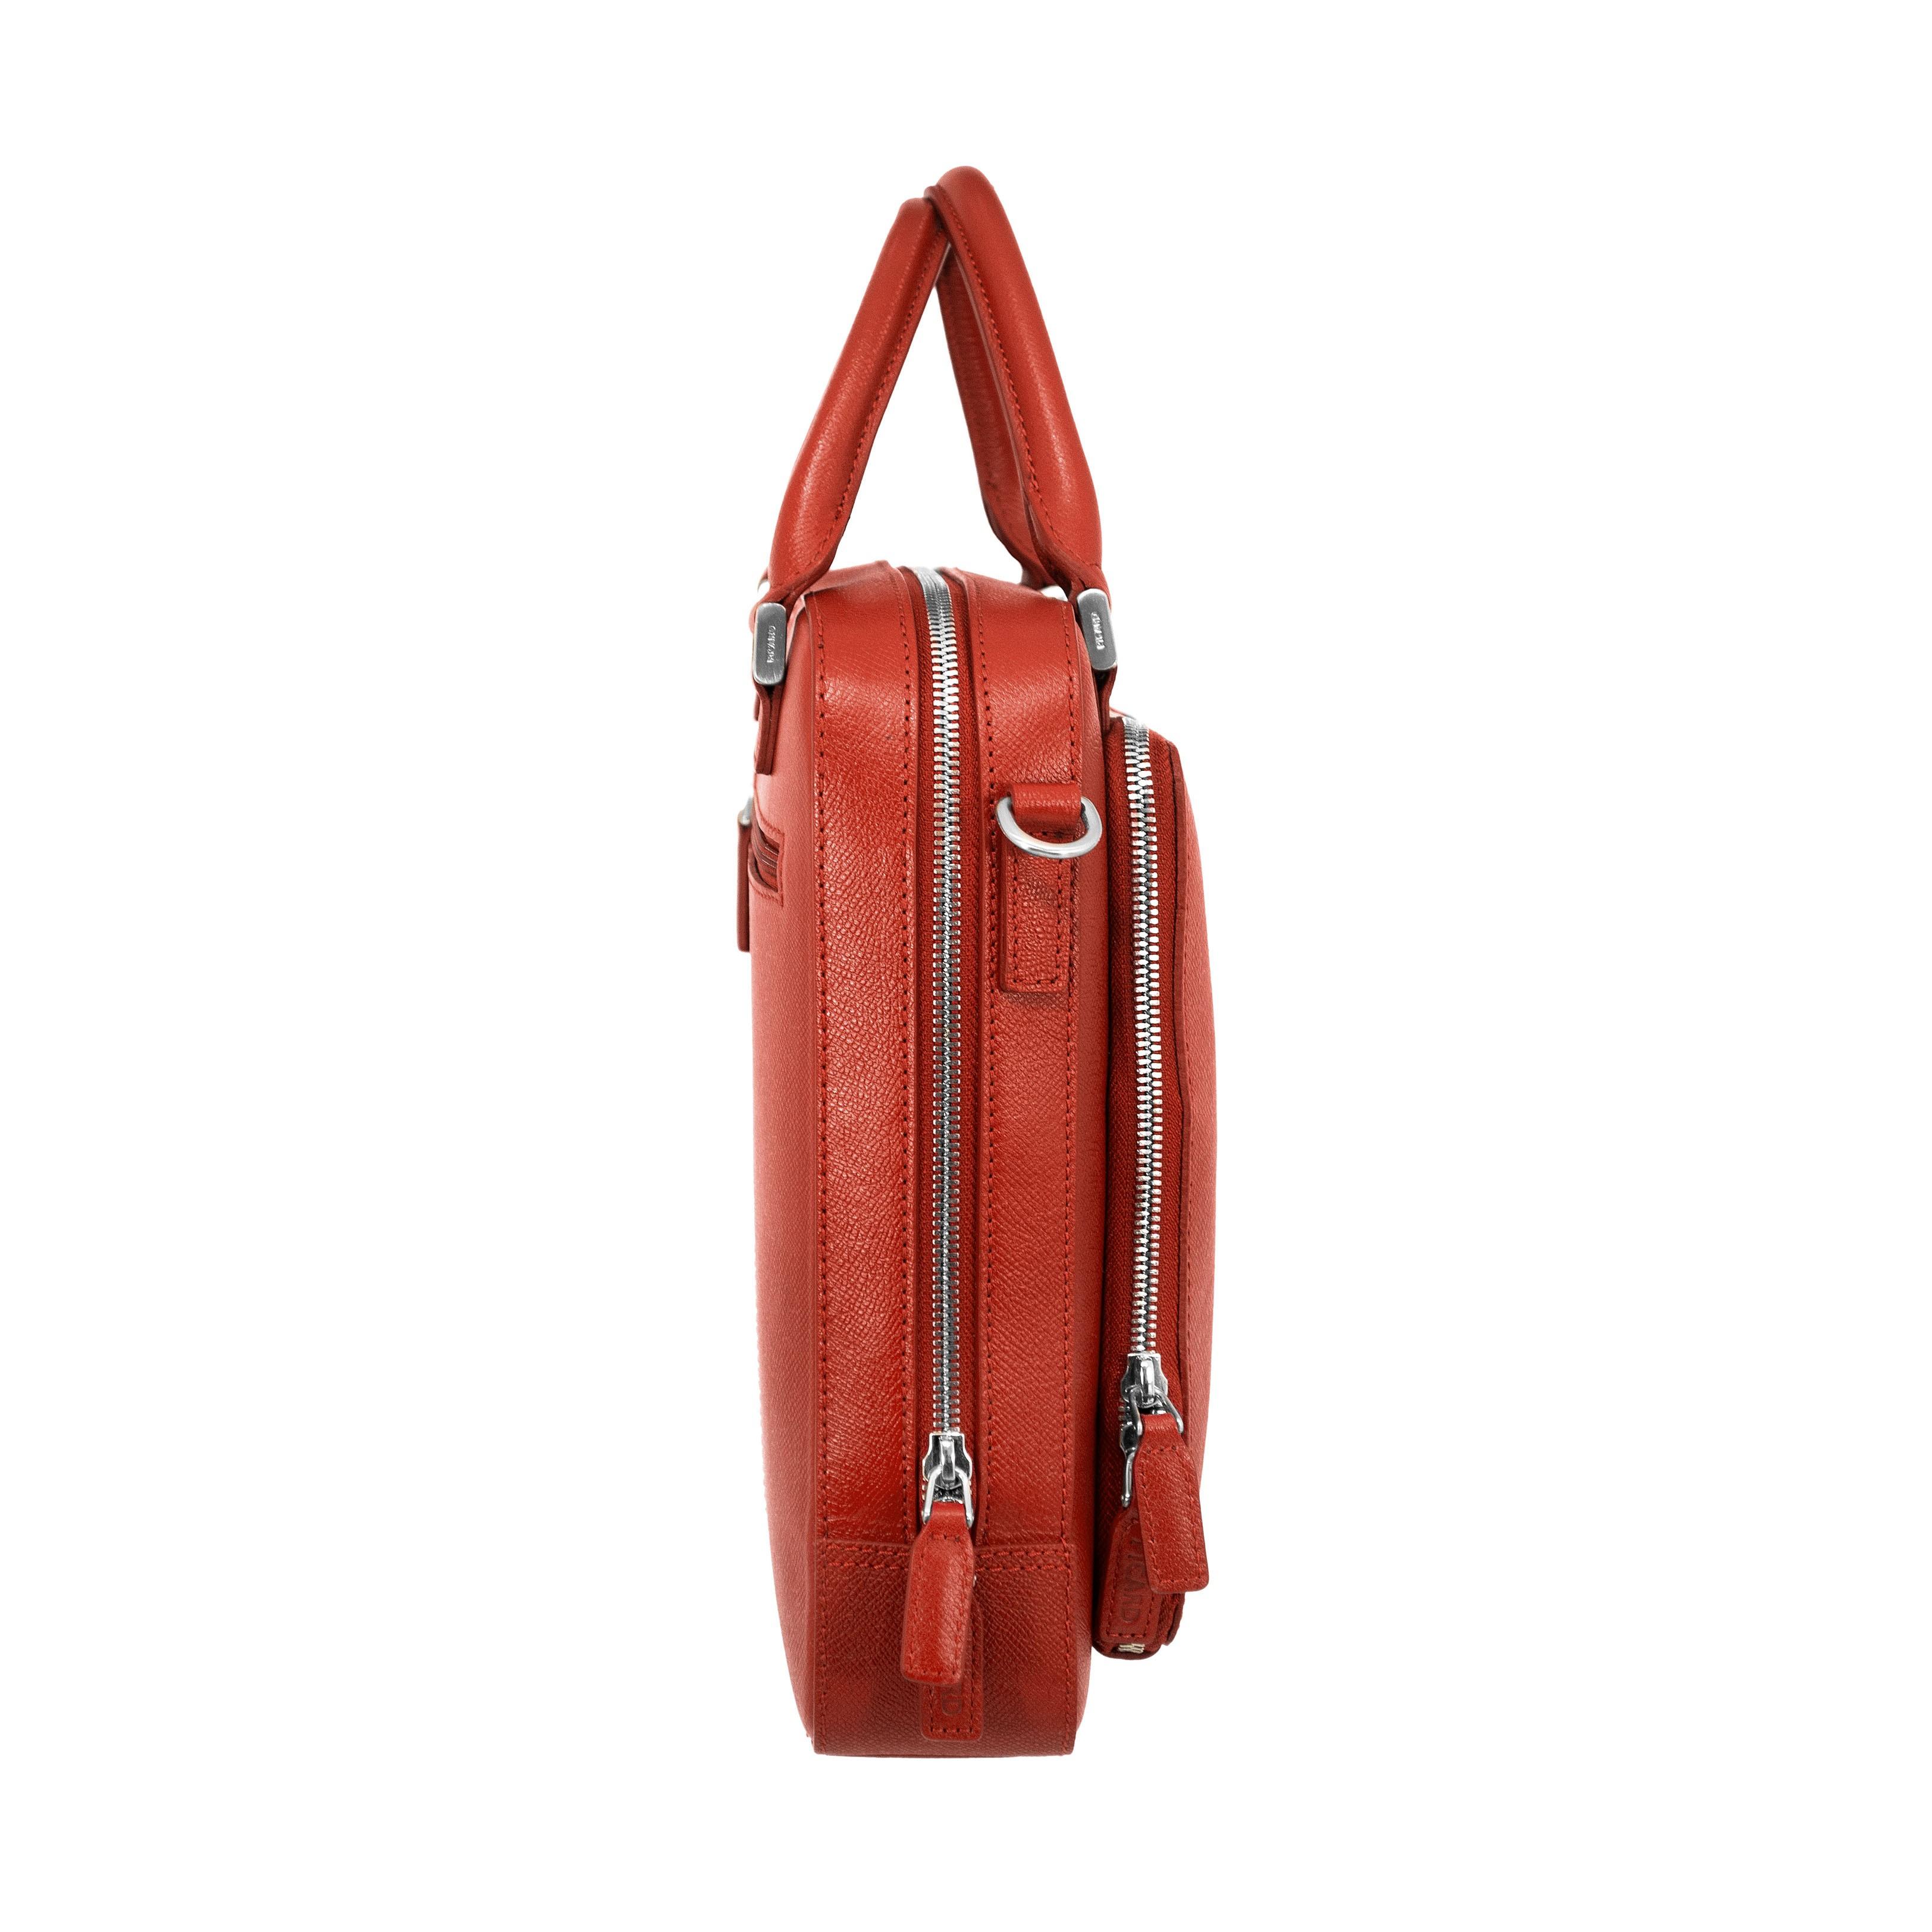 0f4b7a158bccb ... PICARD Business Damen Tasche Leder Aktentasche Laptoptasche Soho Rot  8273 002 ...